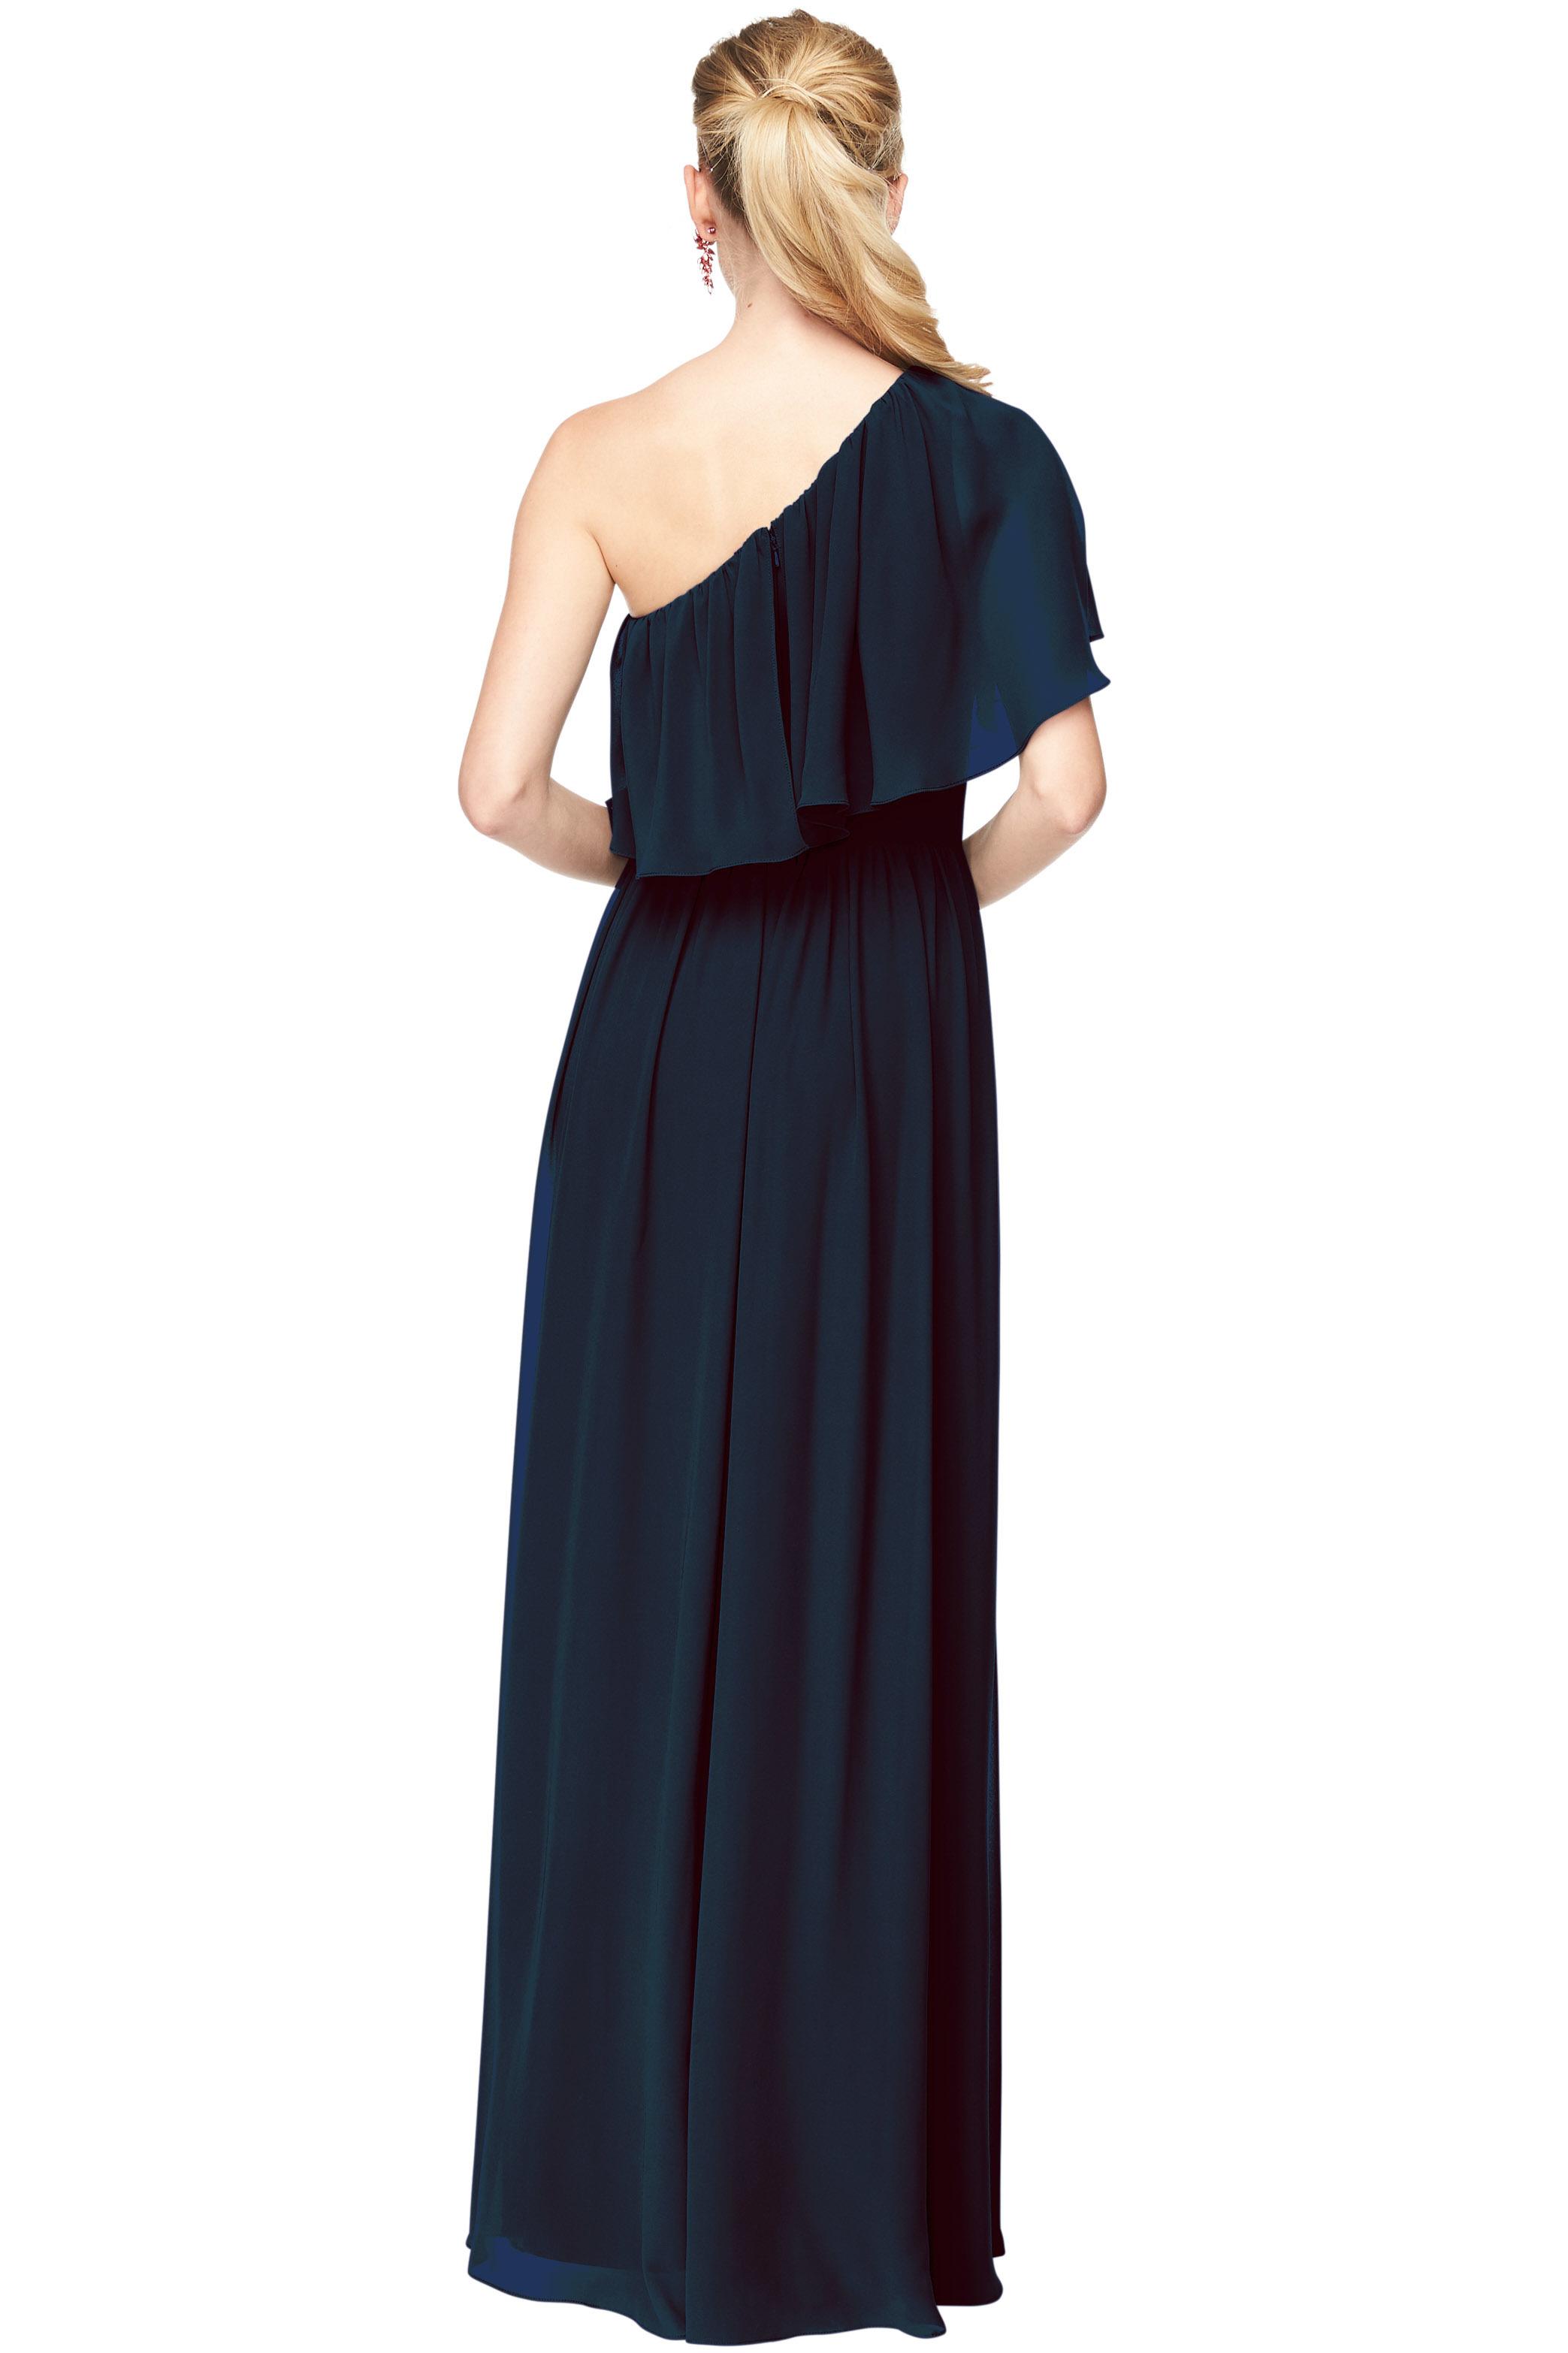 Bill Levkoff NAVY Chiffon One-Shoulder A-Line gown, $156.40 Back